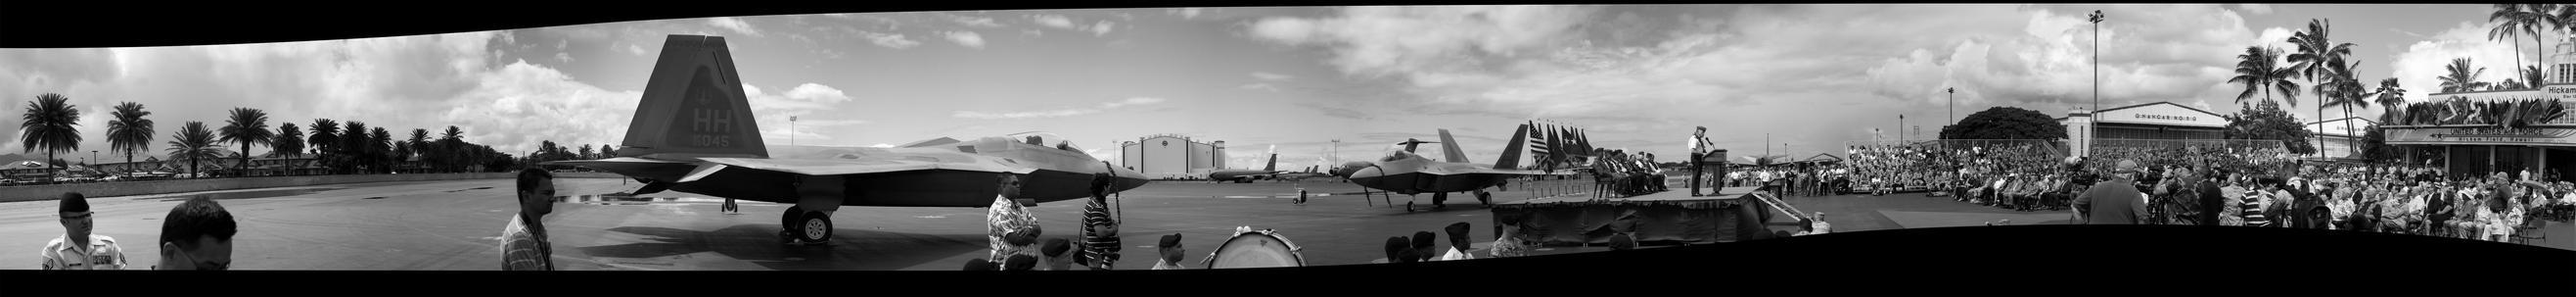 F-22 Raptors at Hickam AFB by gabrielyanagihara